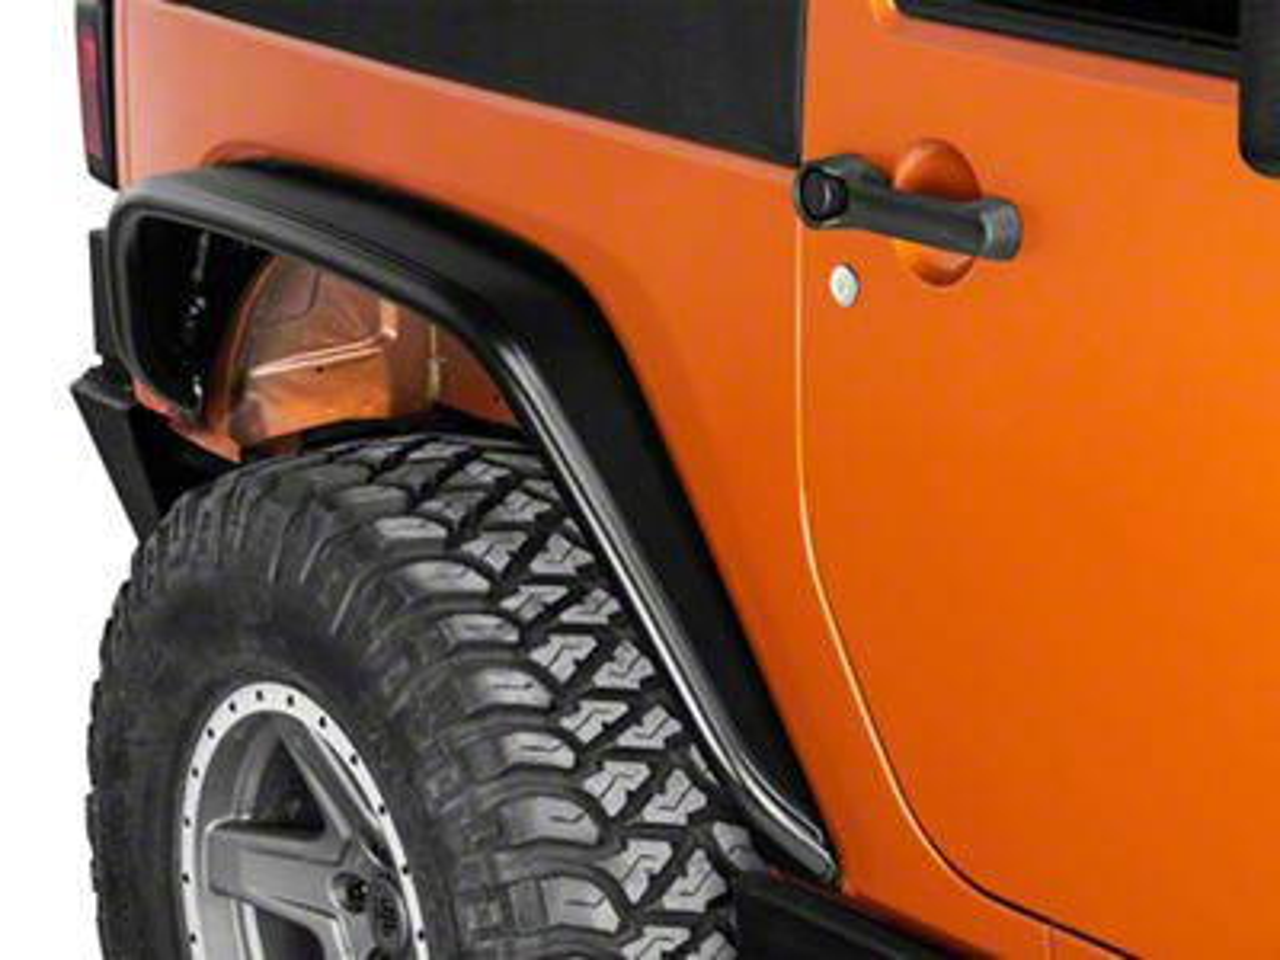 Poison Spyder Crusher Rear Fender Flares - Standard Width - SpyderShell Armor Coat (07-18 Jeep Wrangler JK)